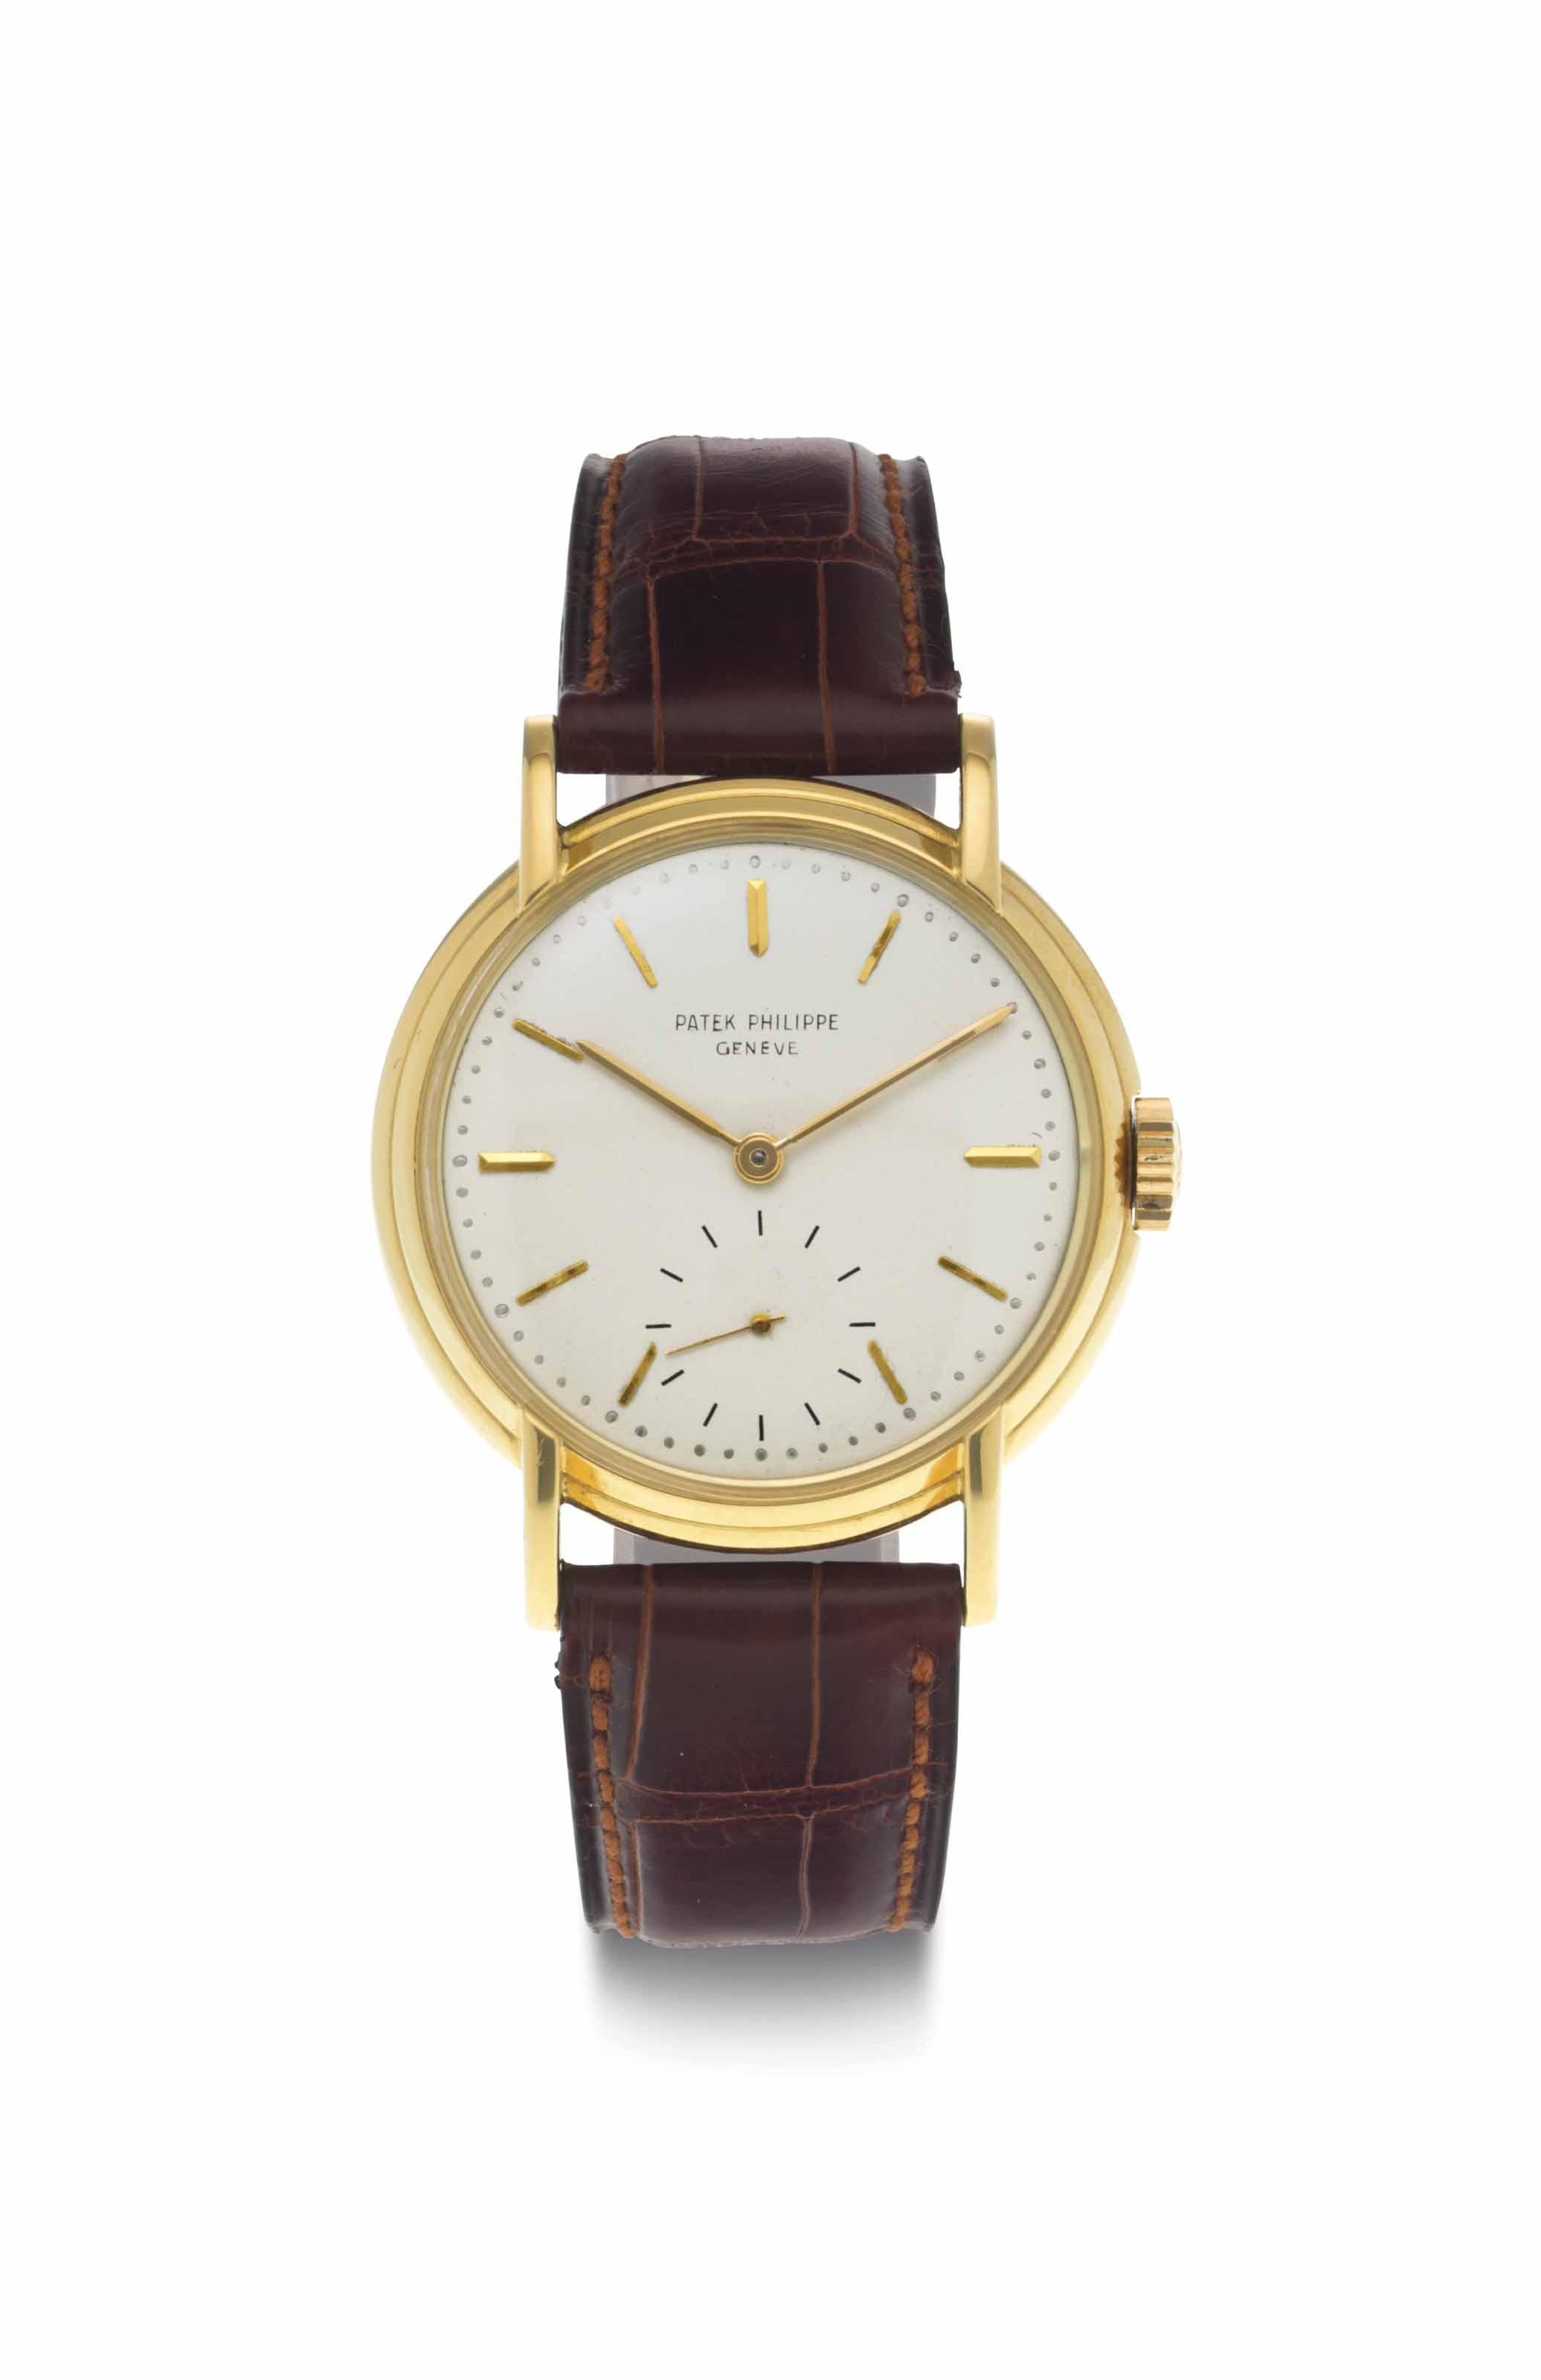 Patek philippe a fine and rare 18k gold wristwatch signed patek philippe geneve ref 2454 for Patek philippe geneve